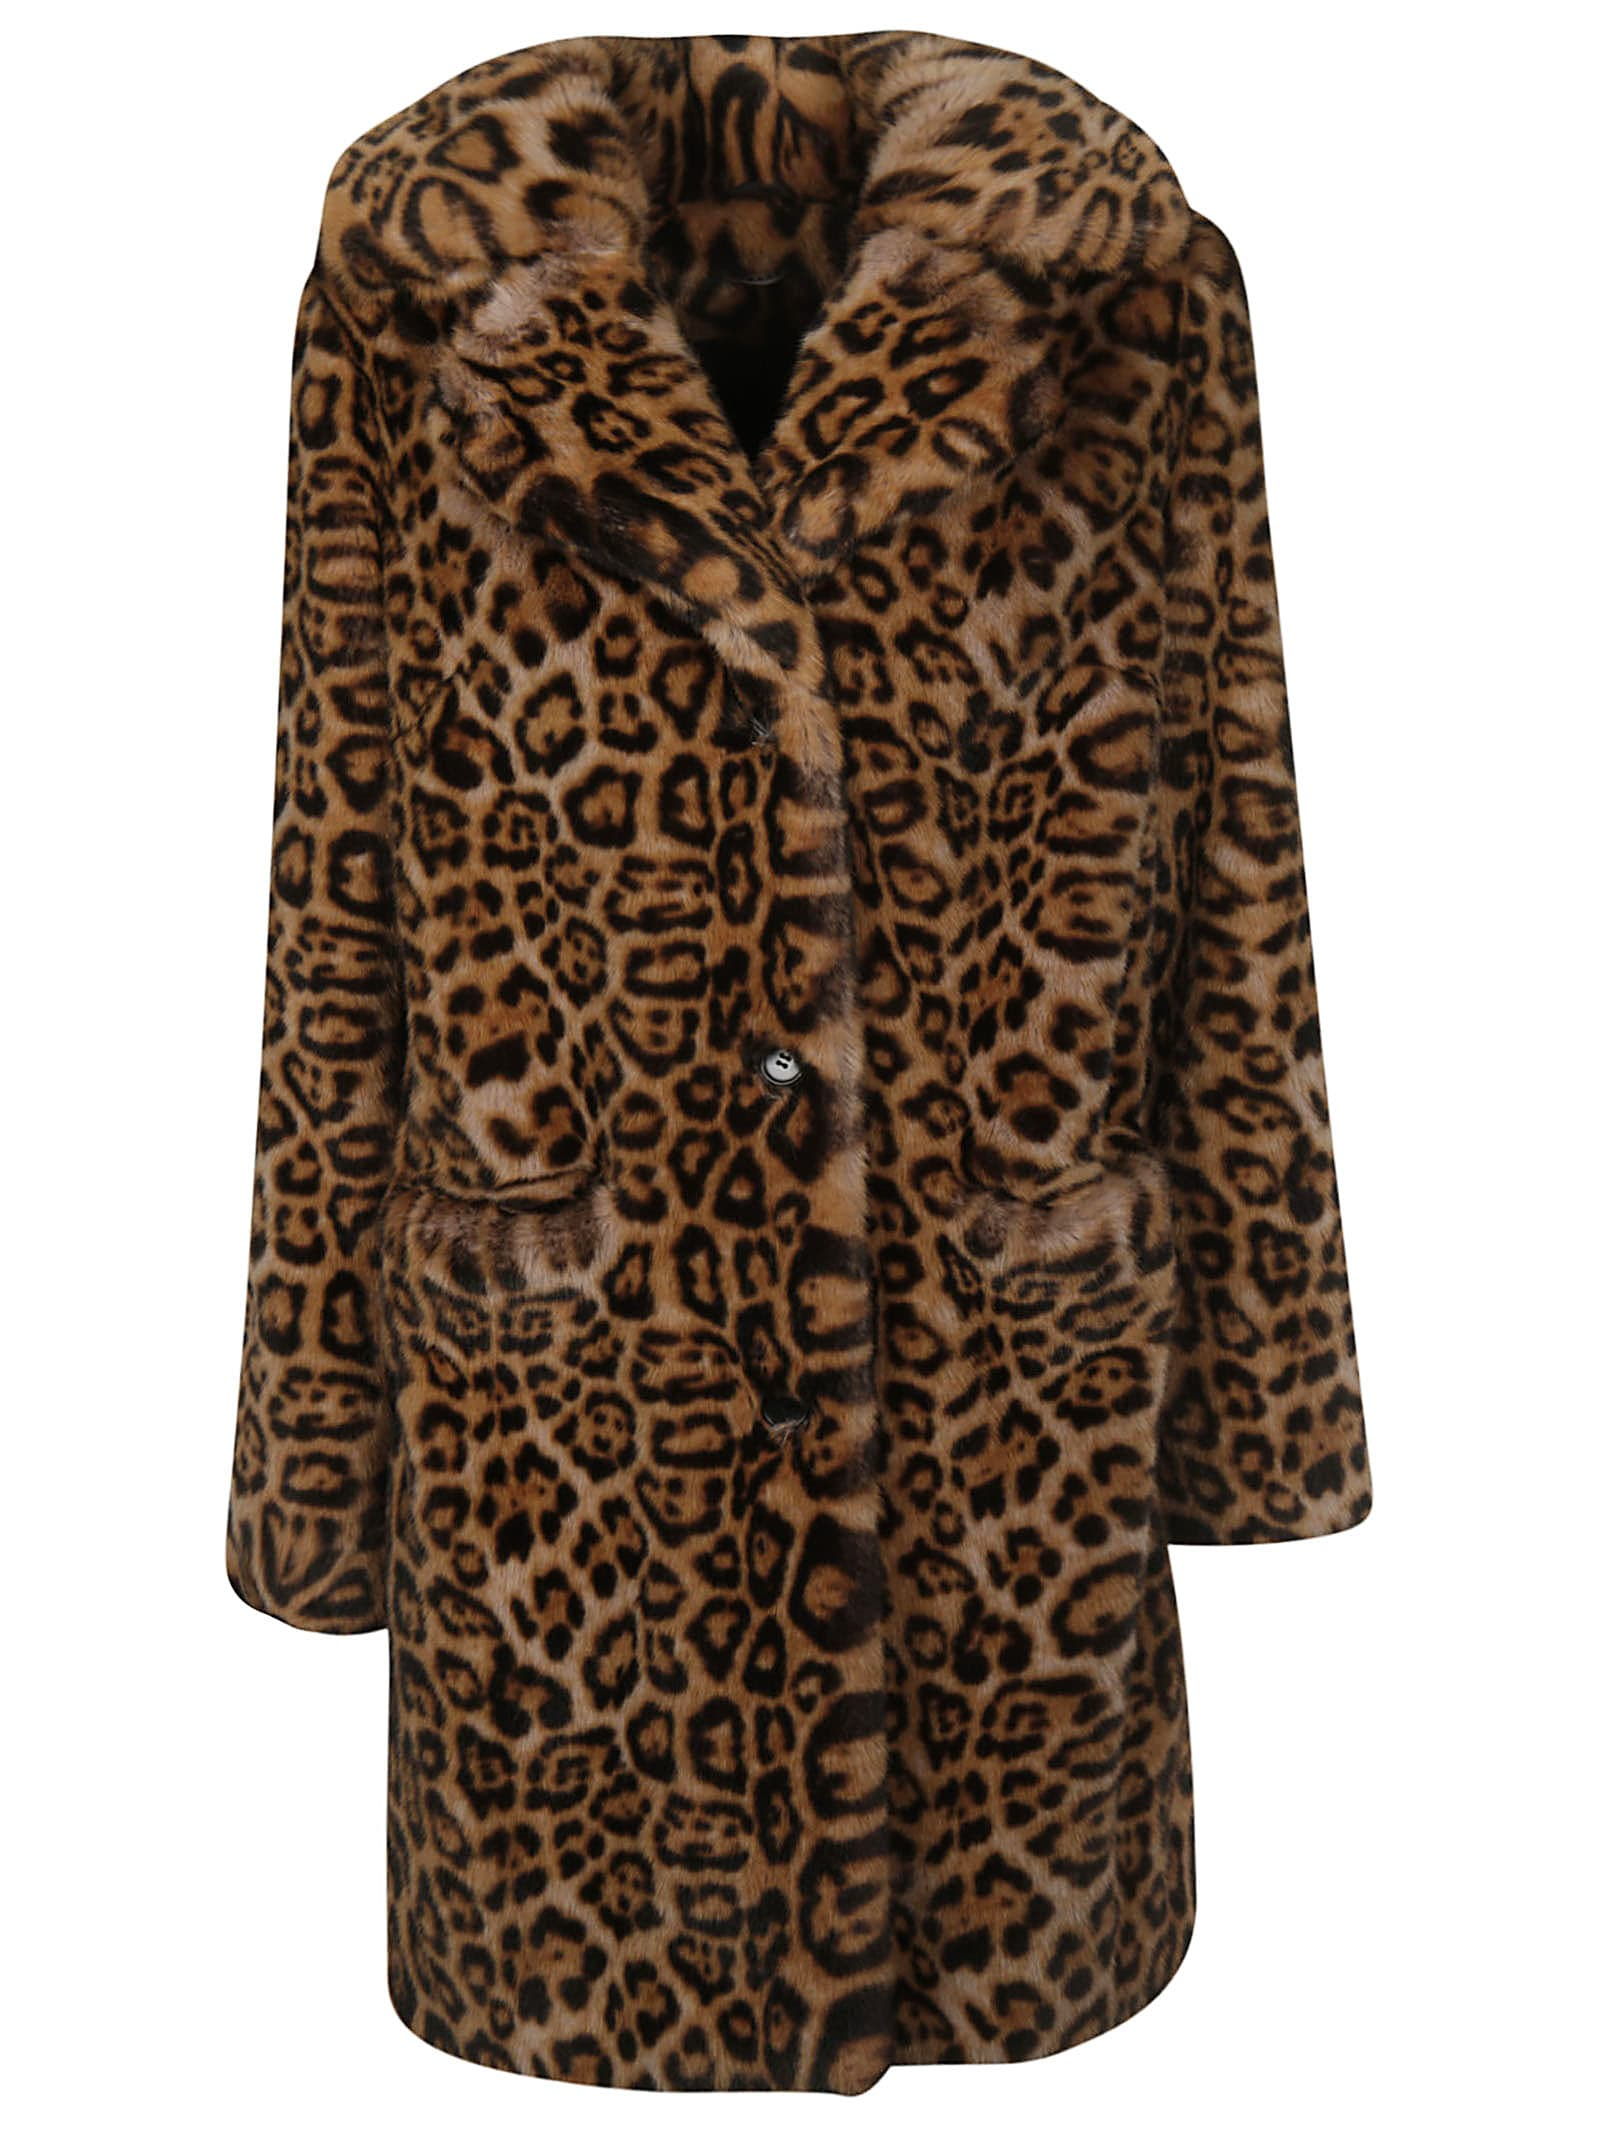 Parosh Pangue Coat